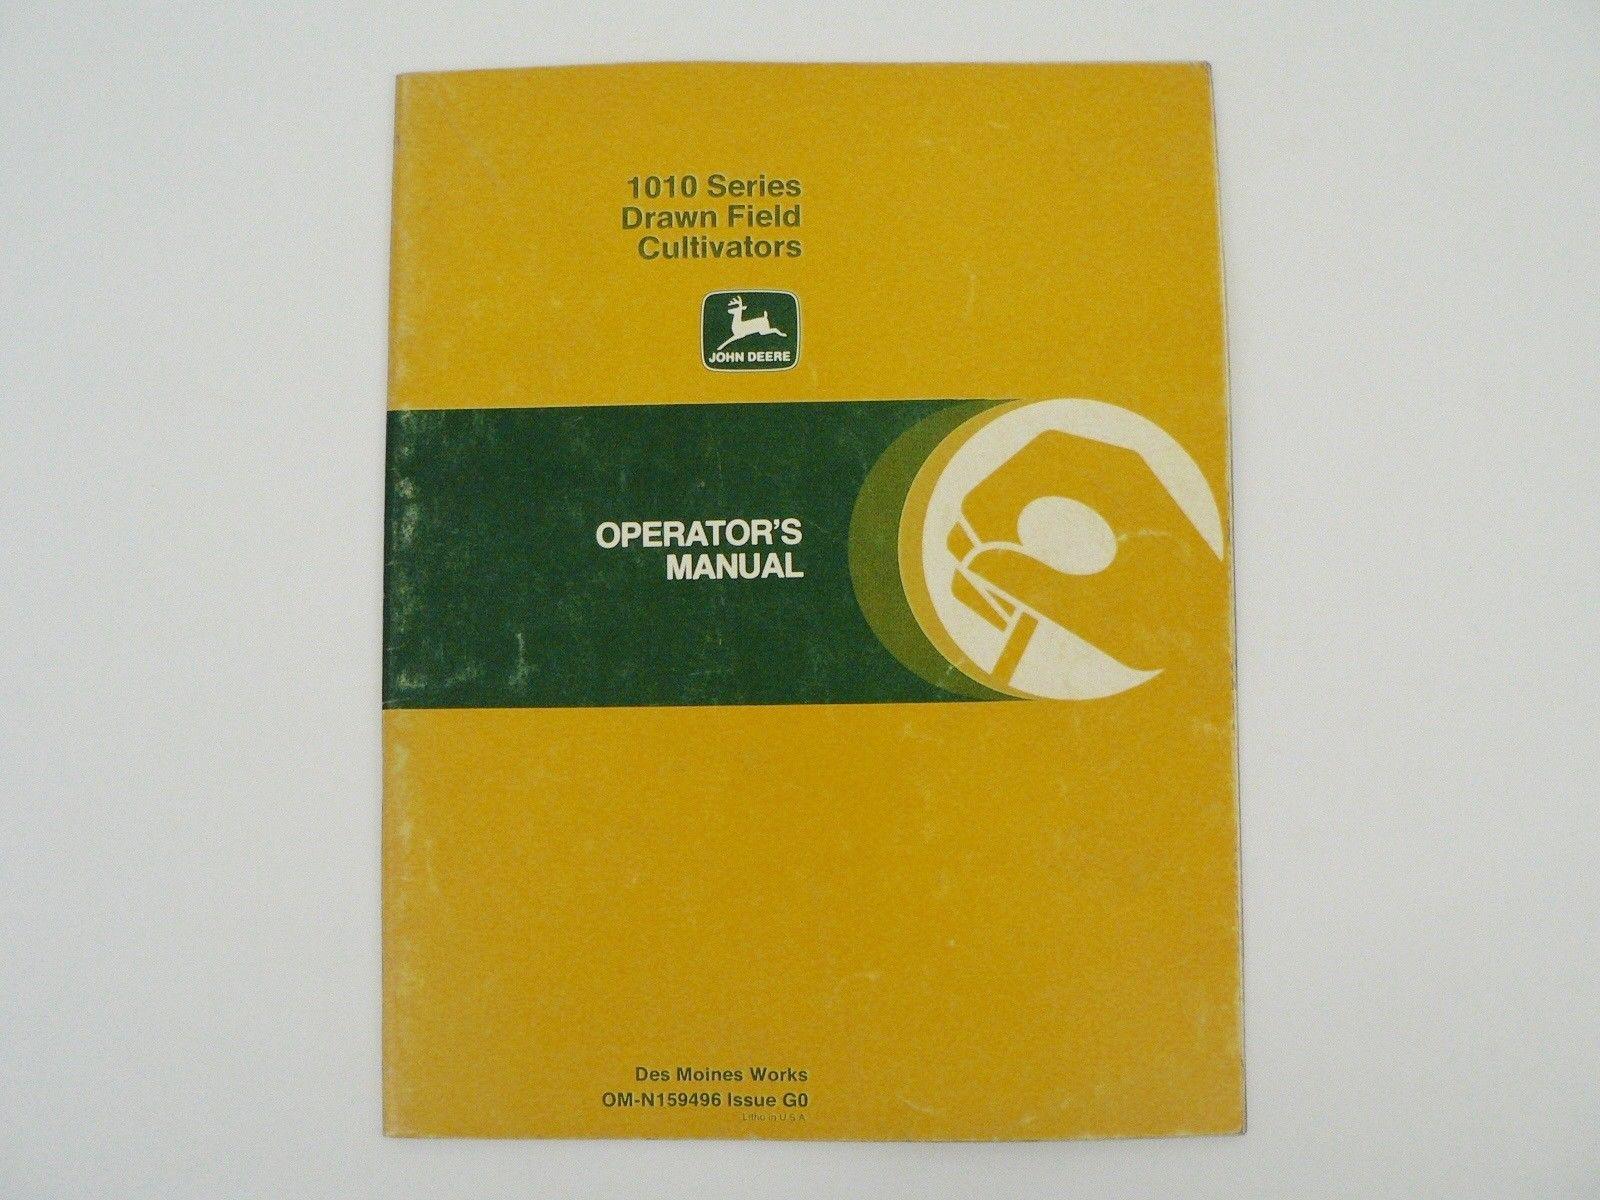 John Deere Owners Manual 1010 Series Drawn Field Cultivators Trouble  Shooting